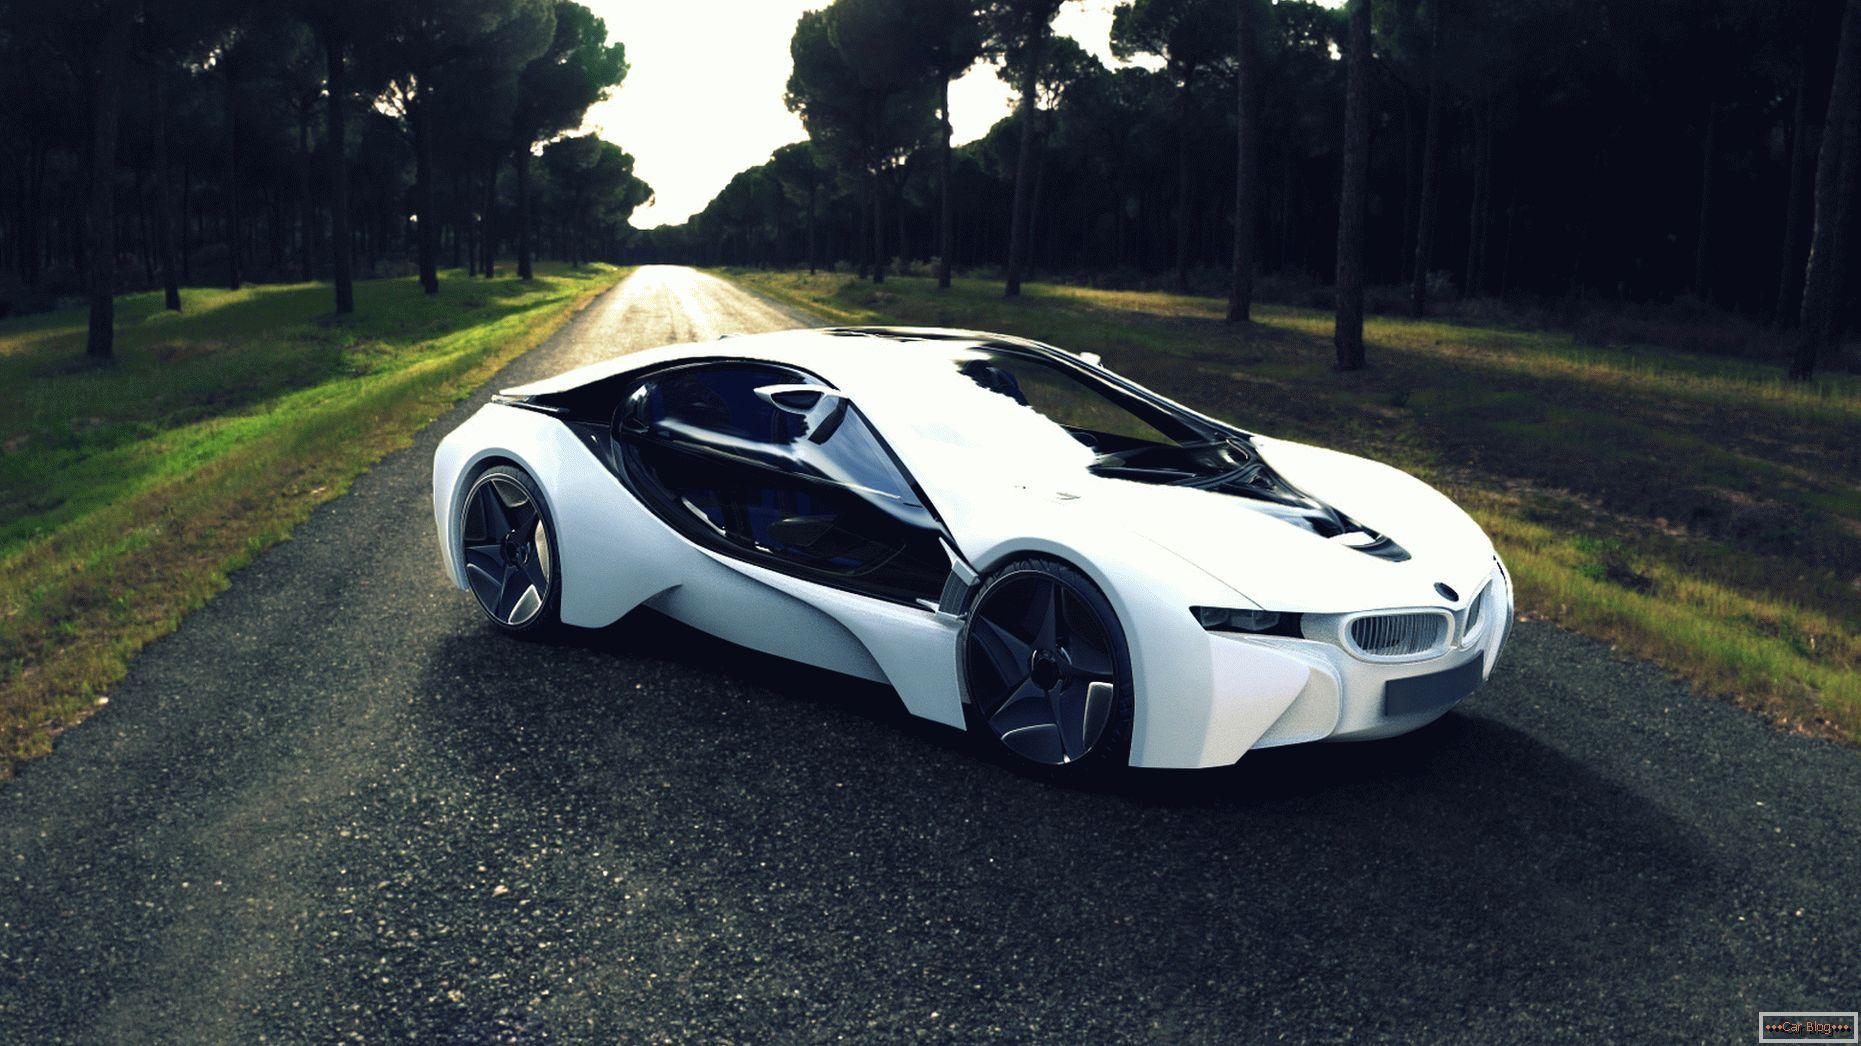 BMW i8 - первый гибридный суперкар BMW